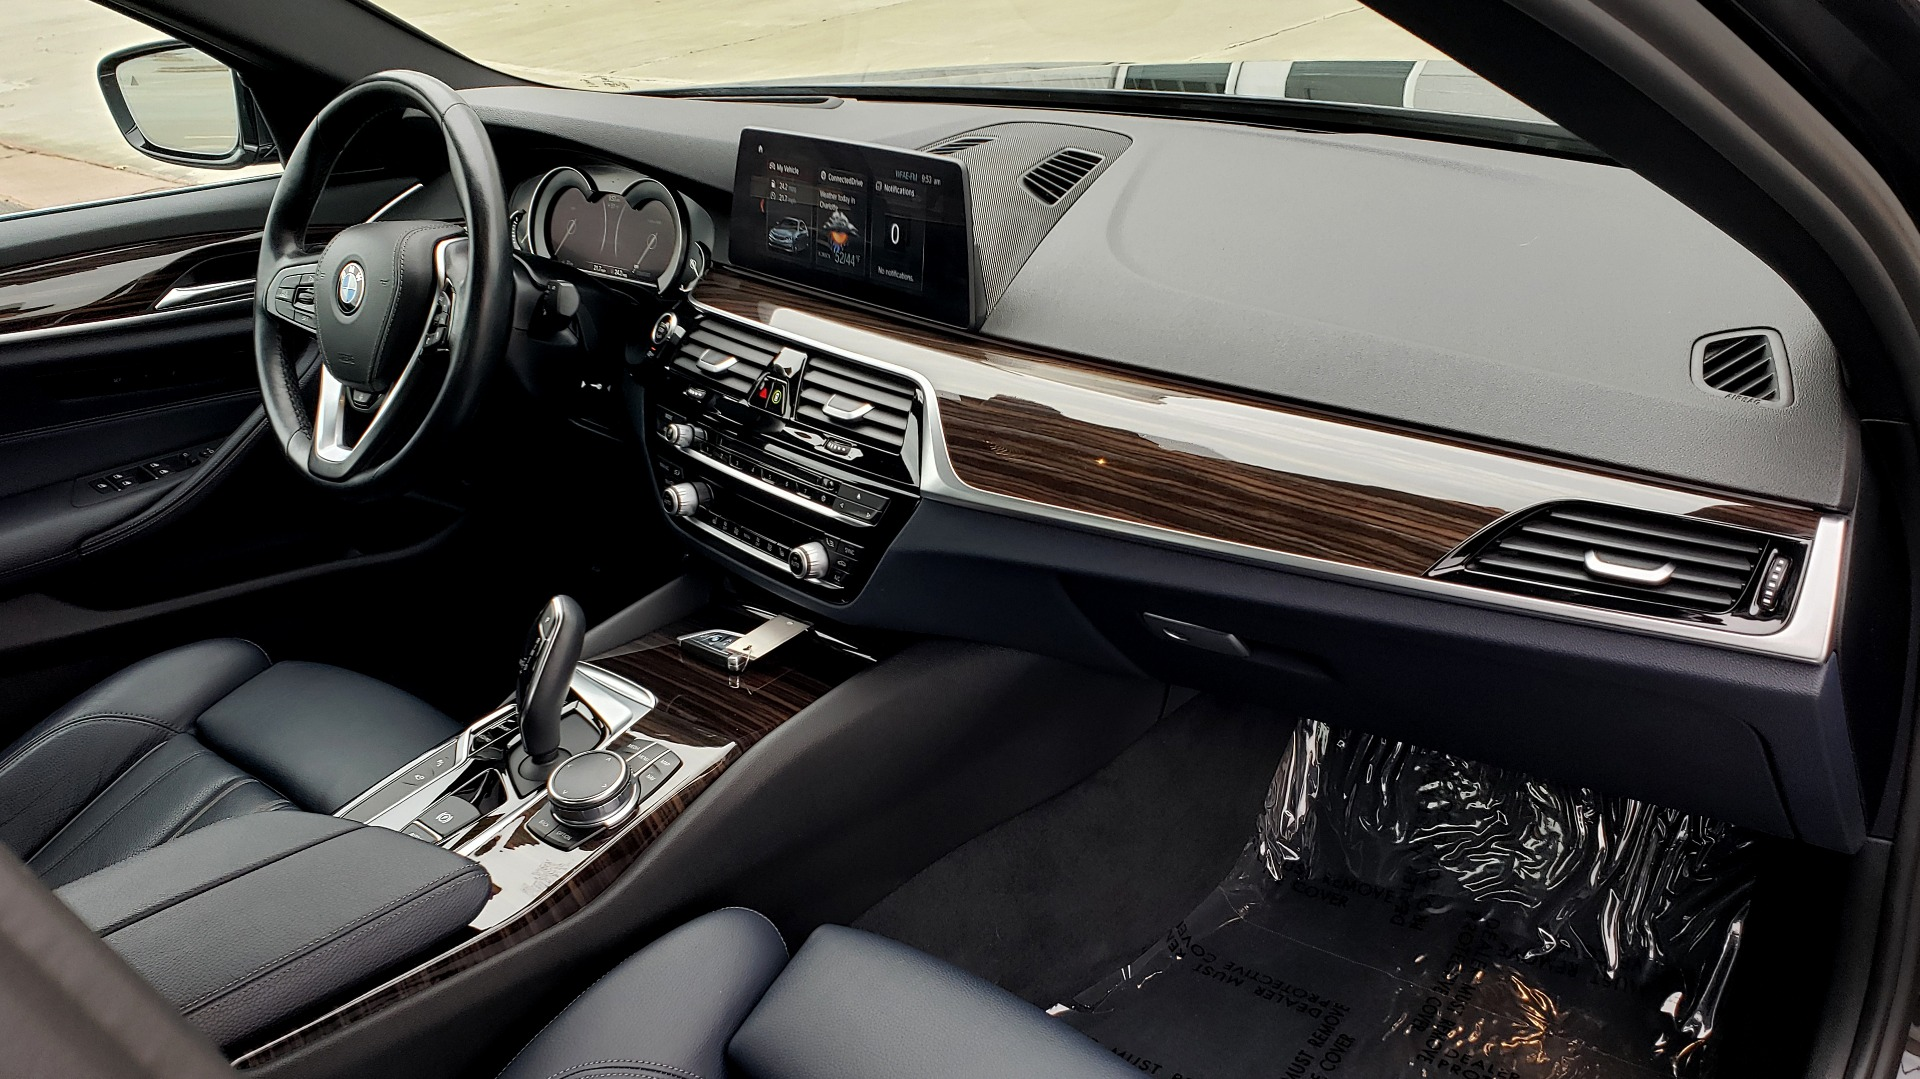 Used 2017 BMW 5 SERIES 530IXDRIVE / PREM PKG / DRVR ASST PLUS / CLD WTHR / APPLE CARPLAY for sale $30,595 at Formula Imports in Charlotte NC 28227 69